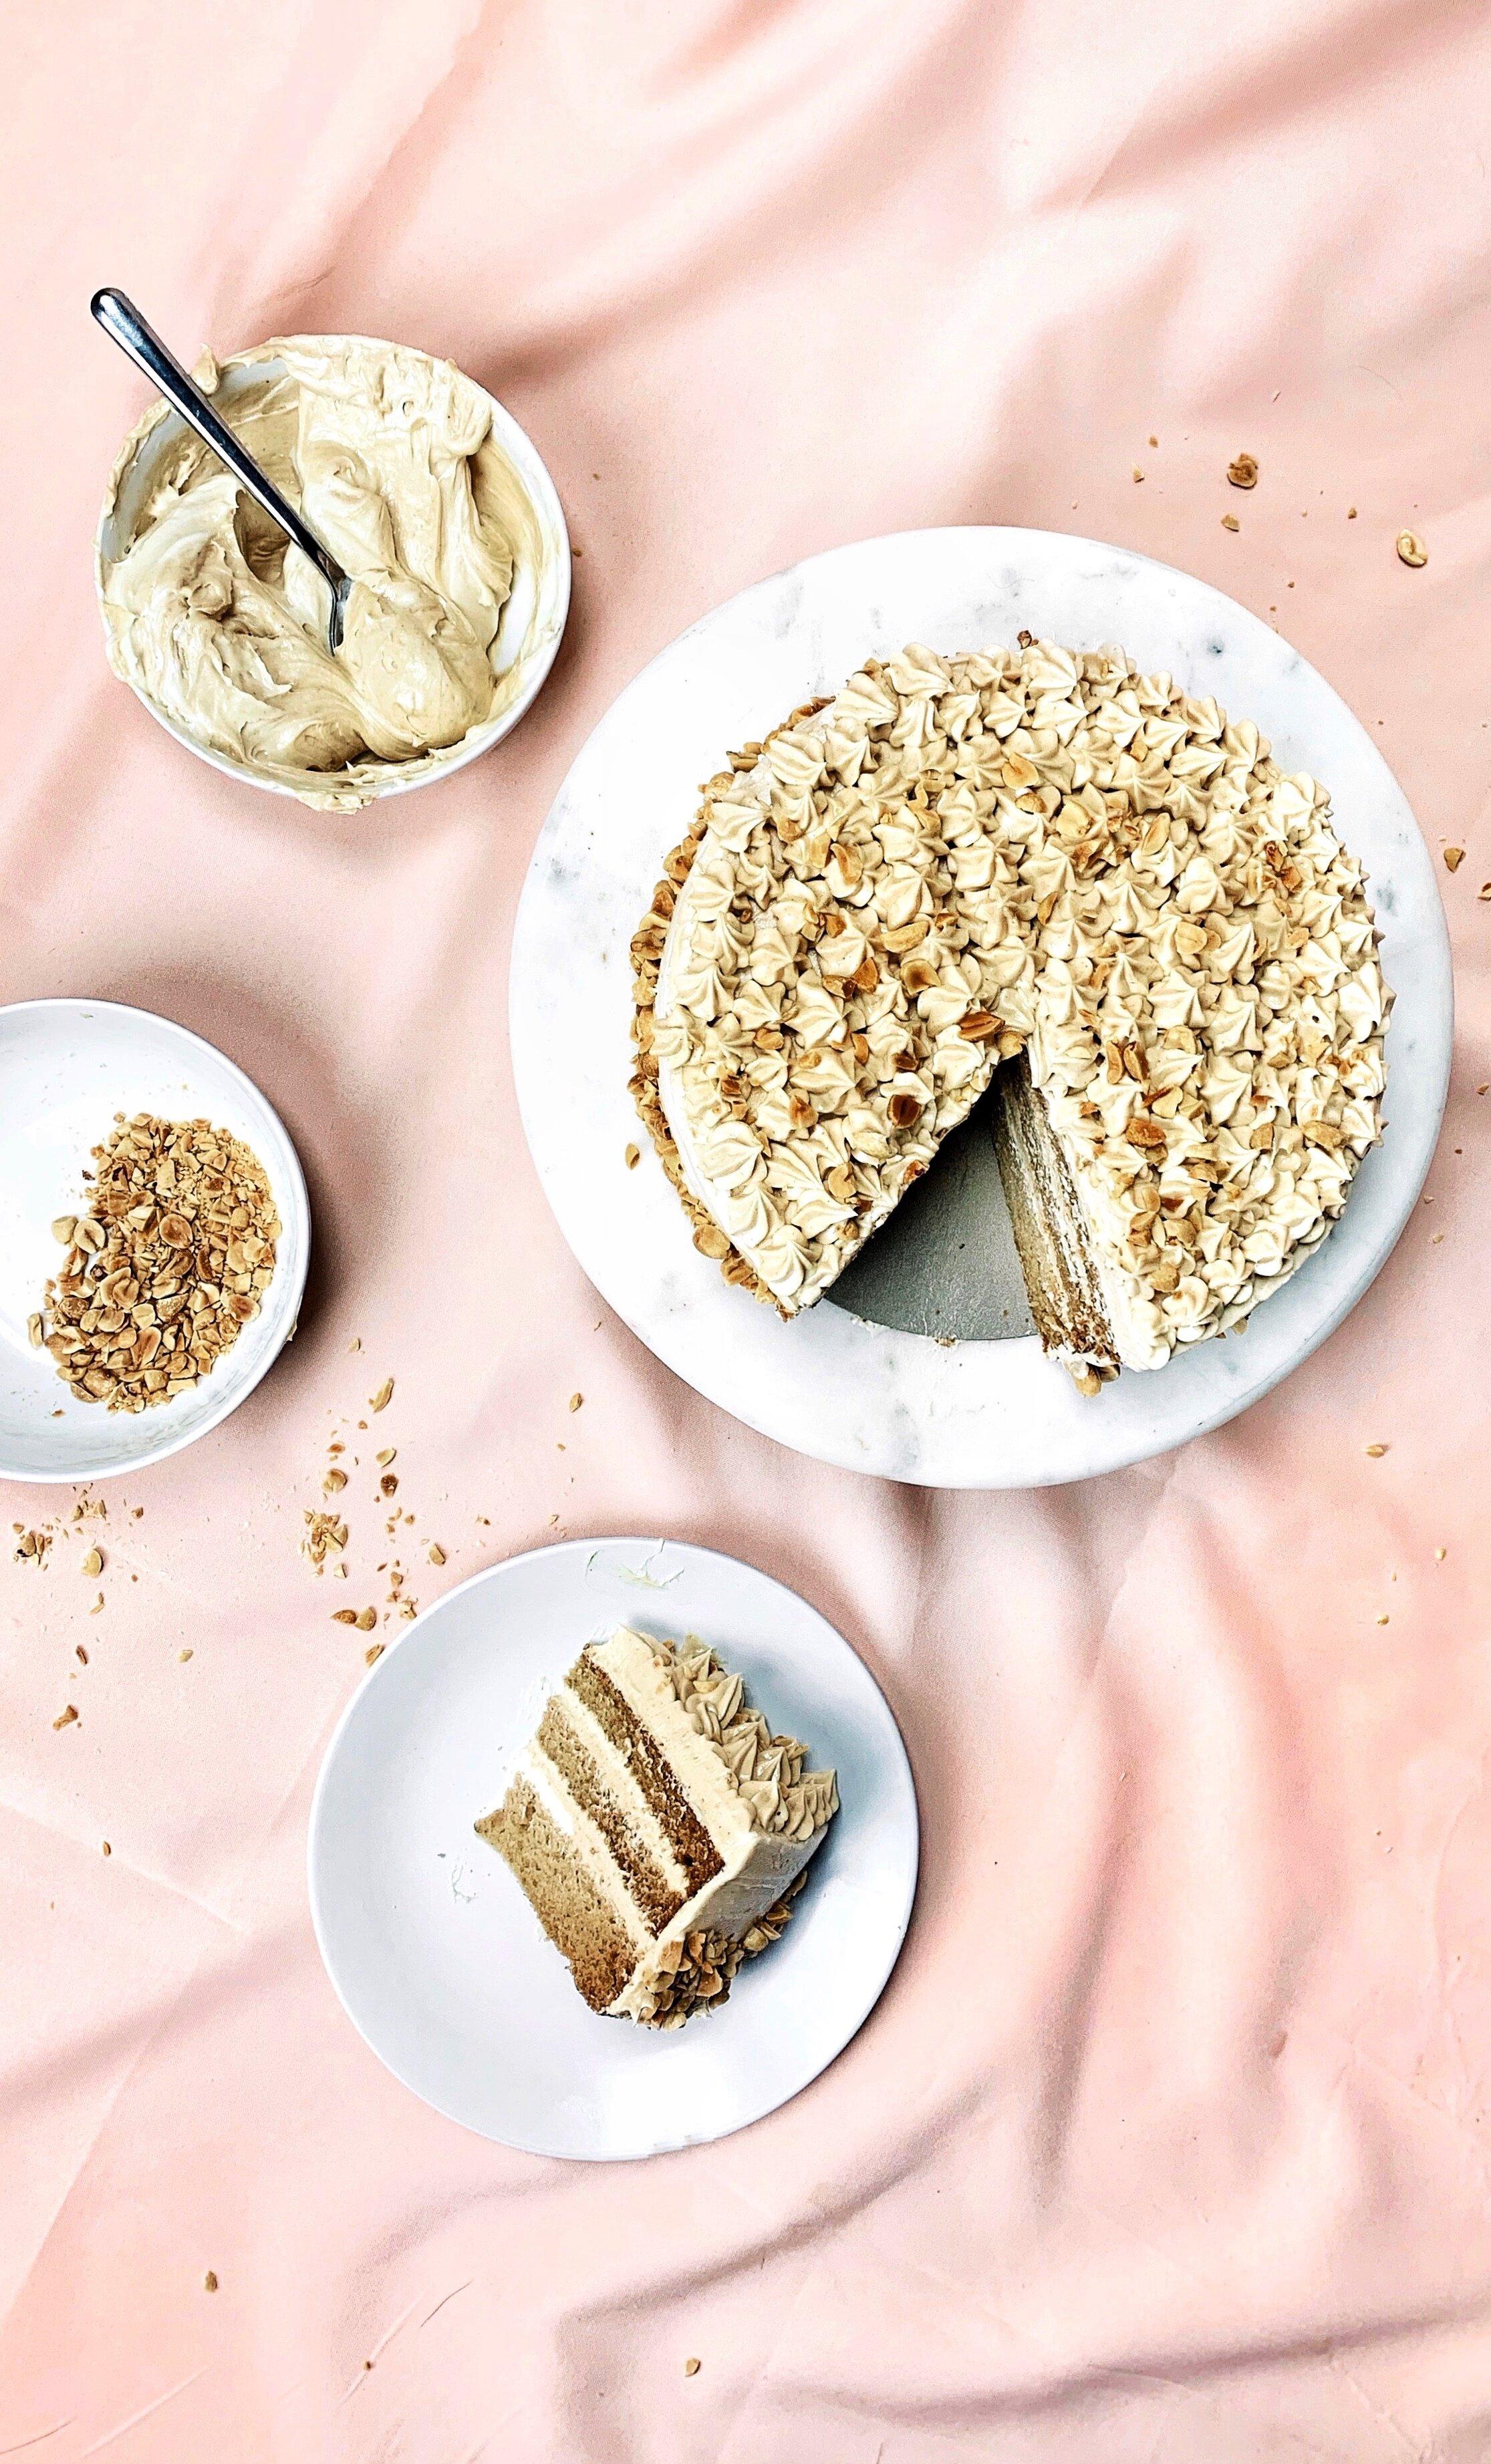 Peanut Butter & Apple Layer Cake - Brad & Butter | Sep 14, 2019